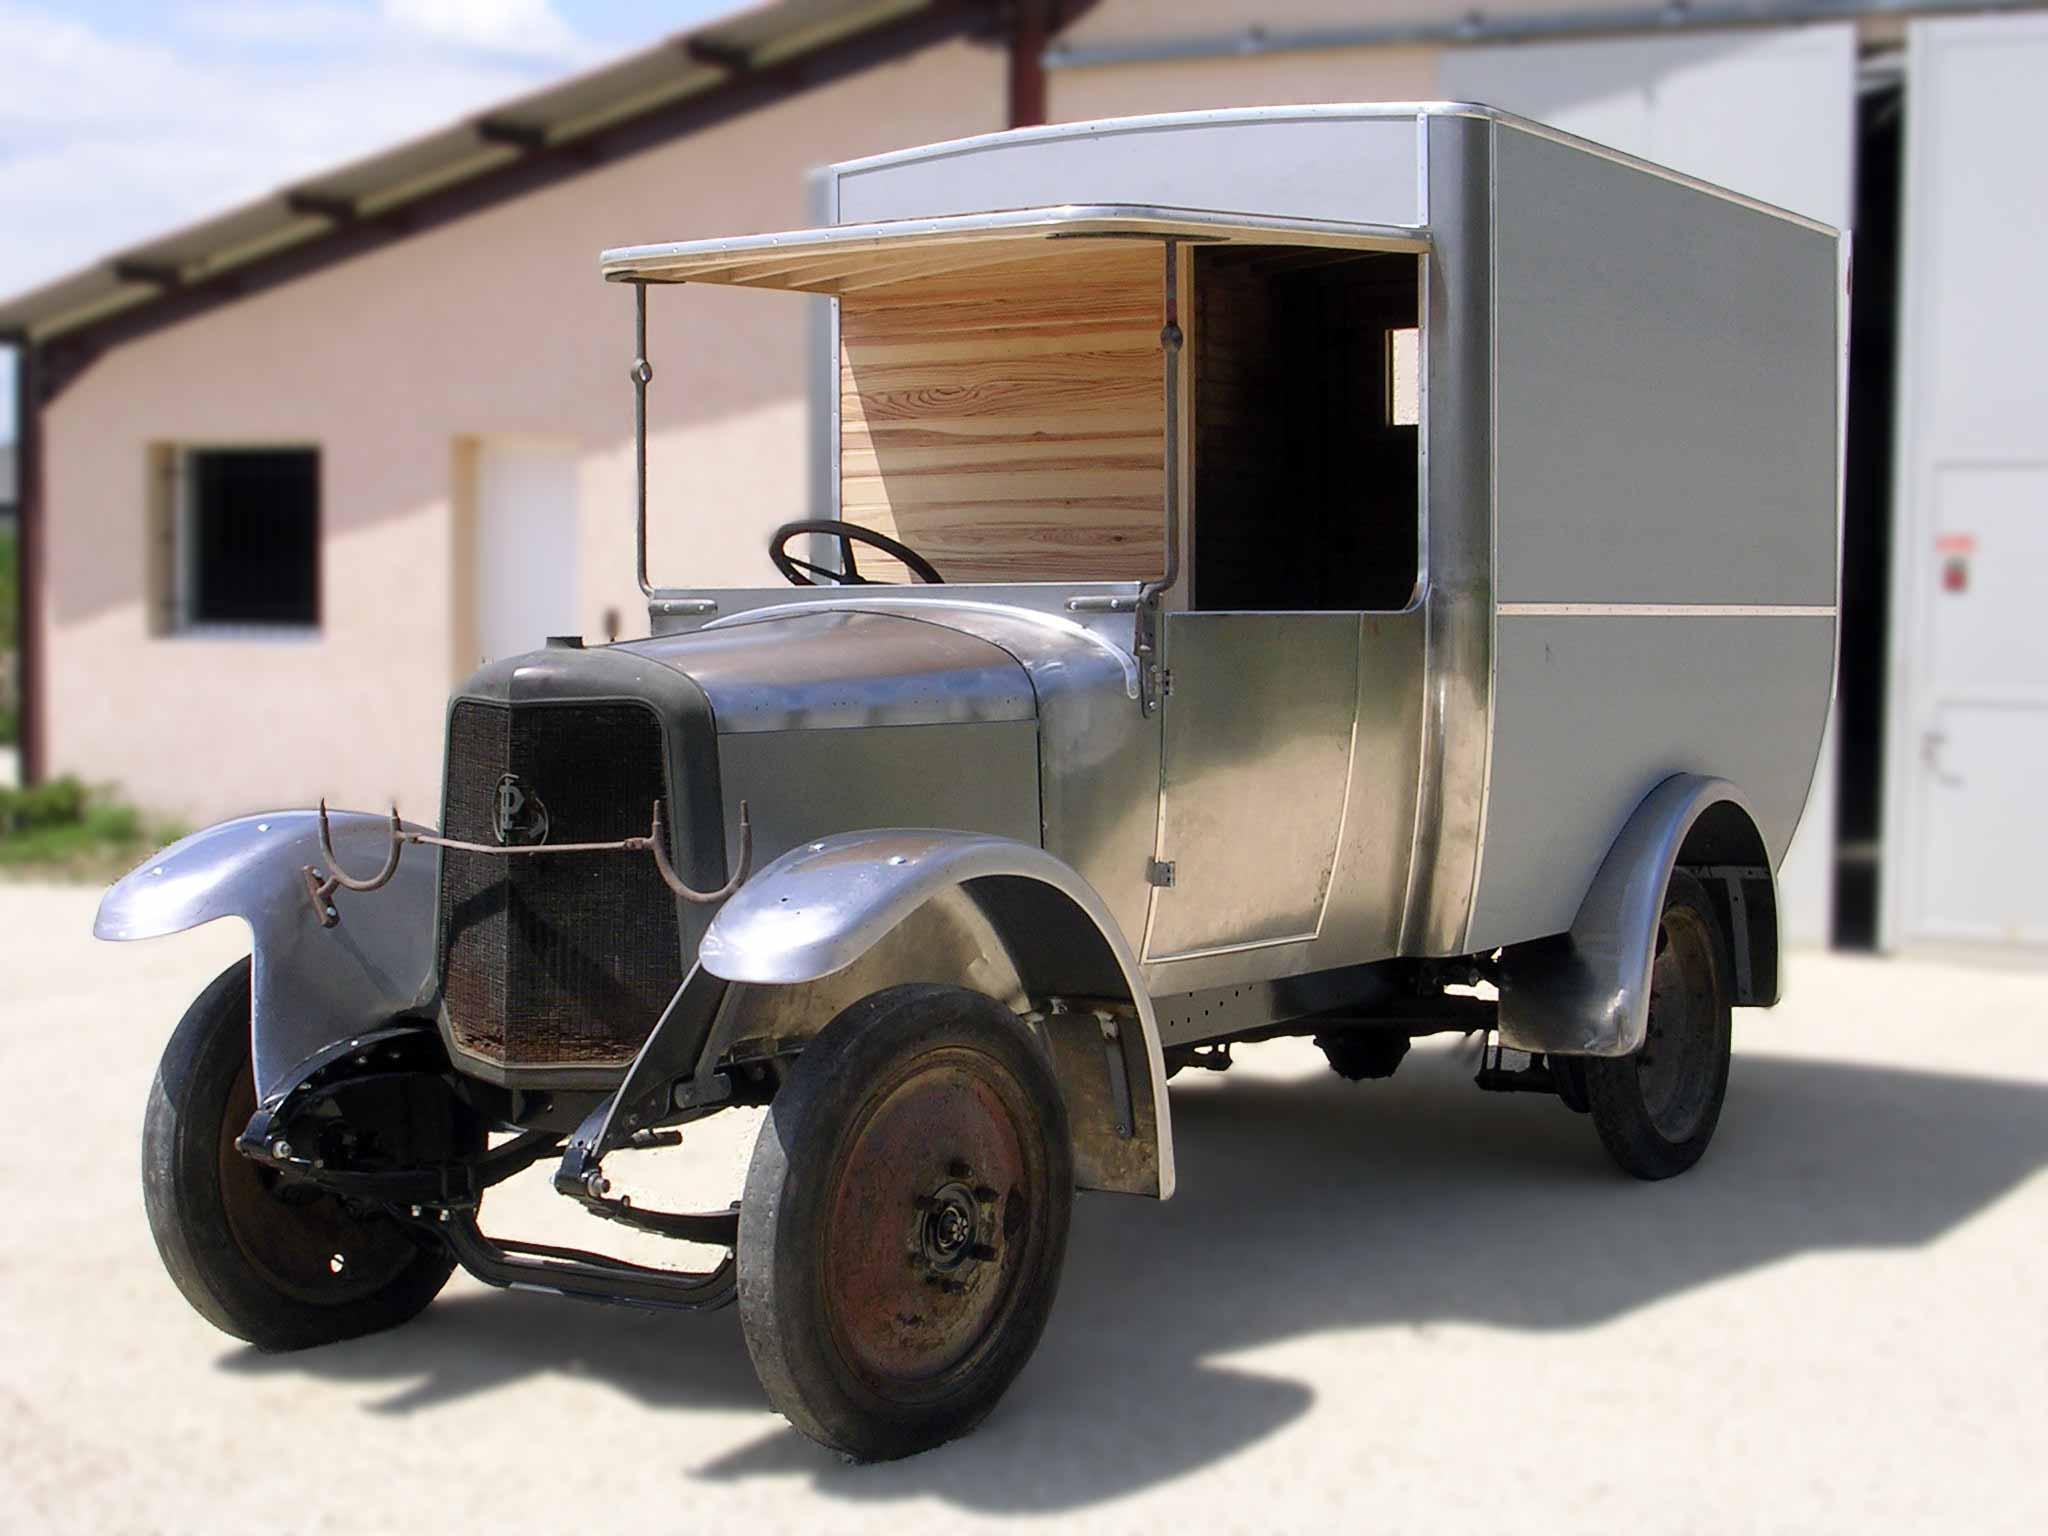 Boiserie automobile sur X25 Panhard Levassor